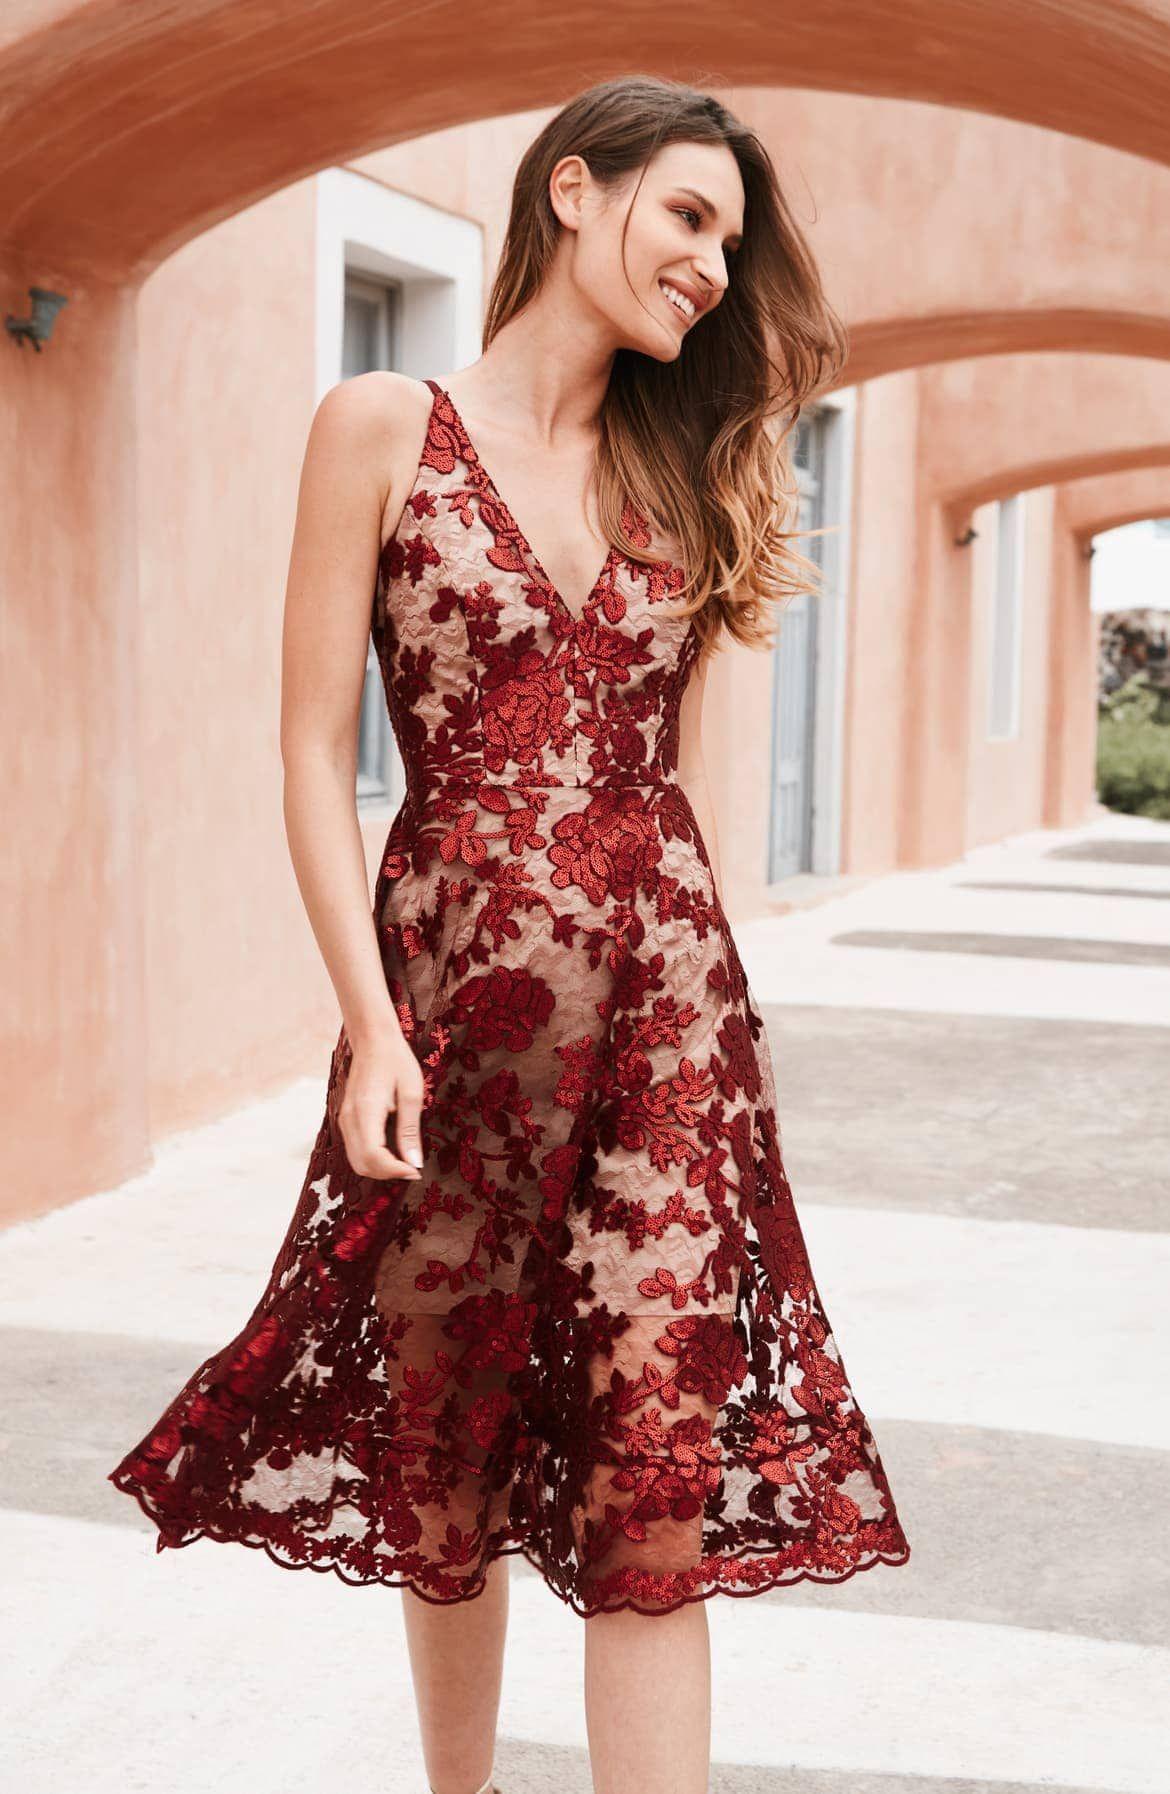 Fall Wedding Guest Dresses di 2020 (Dengan gambar)